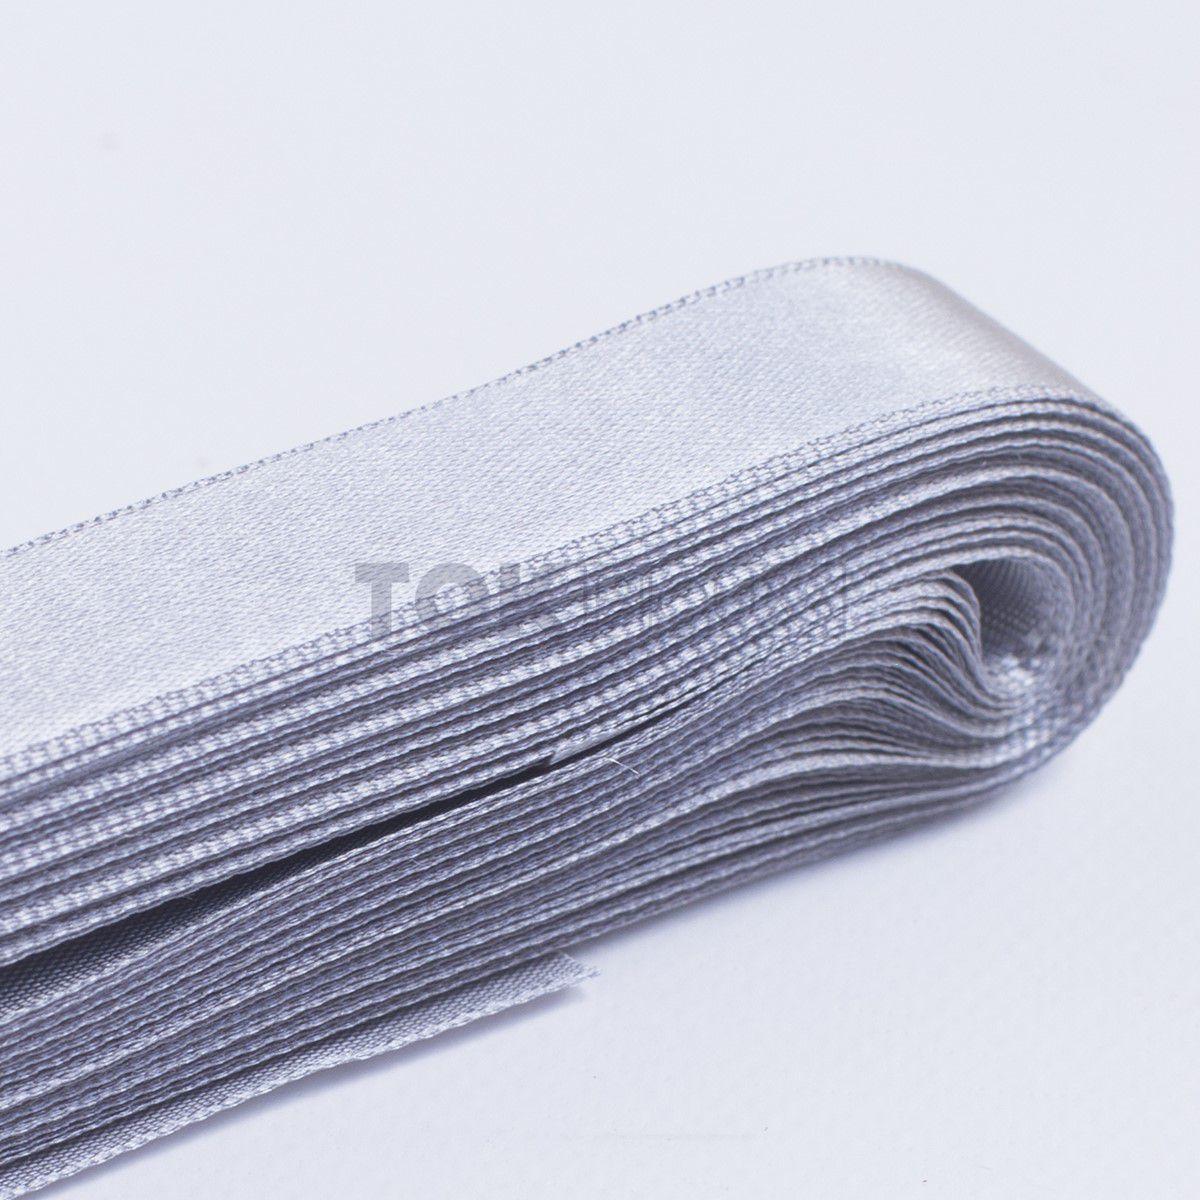 Fita Cetim N.2 - 10mm - 10 Metros - COR (24) Prata